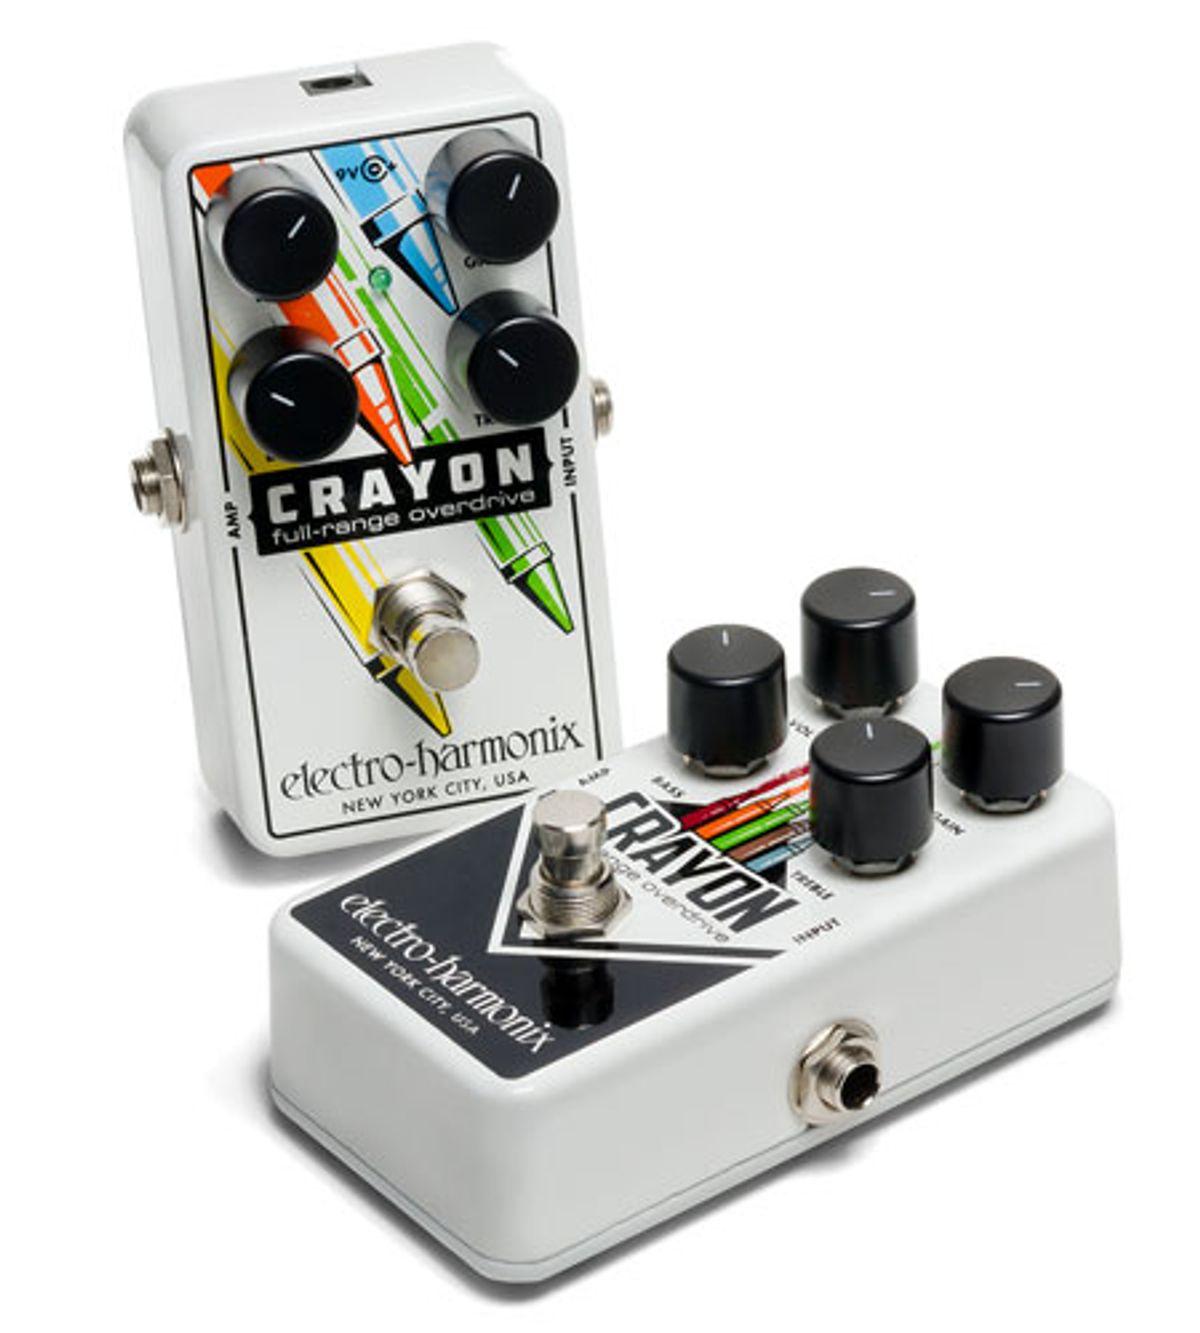 Electro-Harmonix Releases the Crayon Full-Range Overdrive